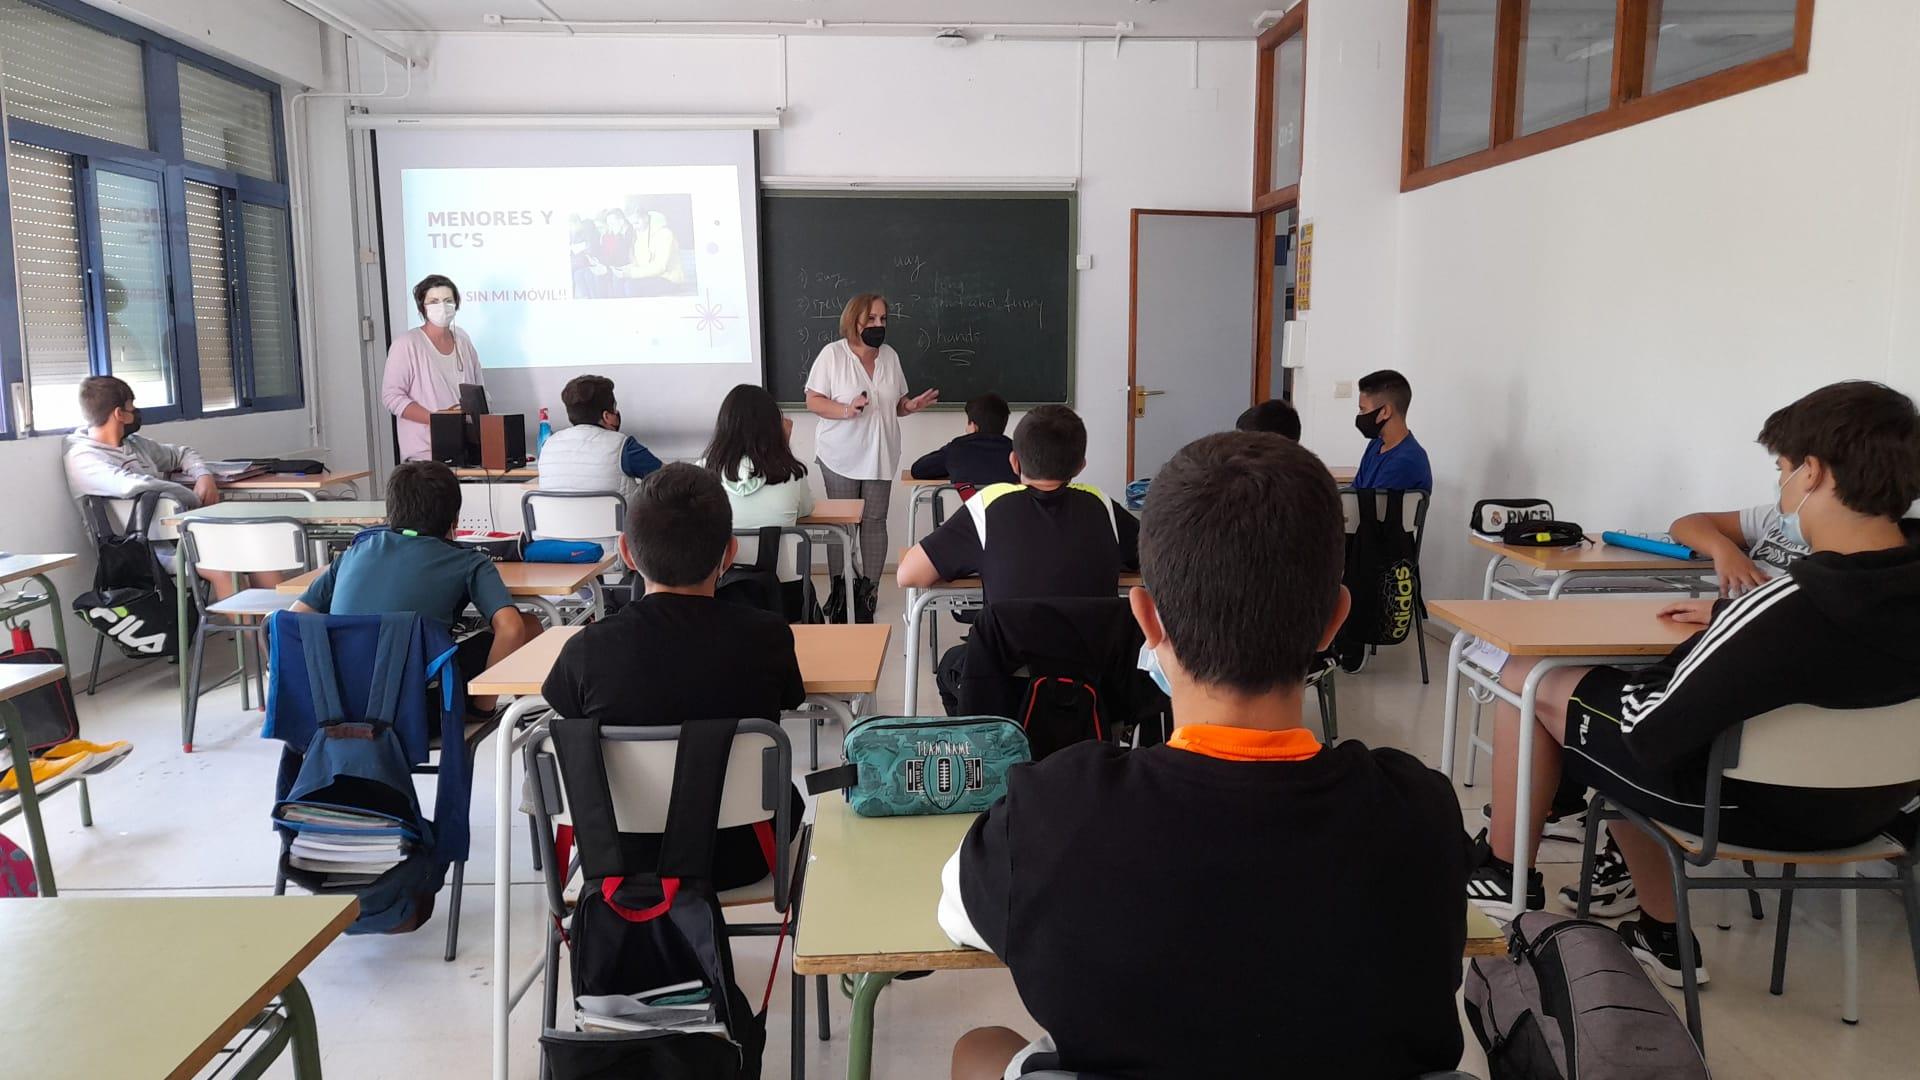 700 alumnos aprenden a prevenir conductas adictivas